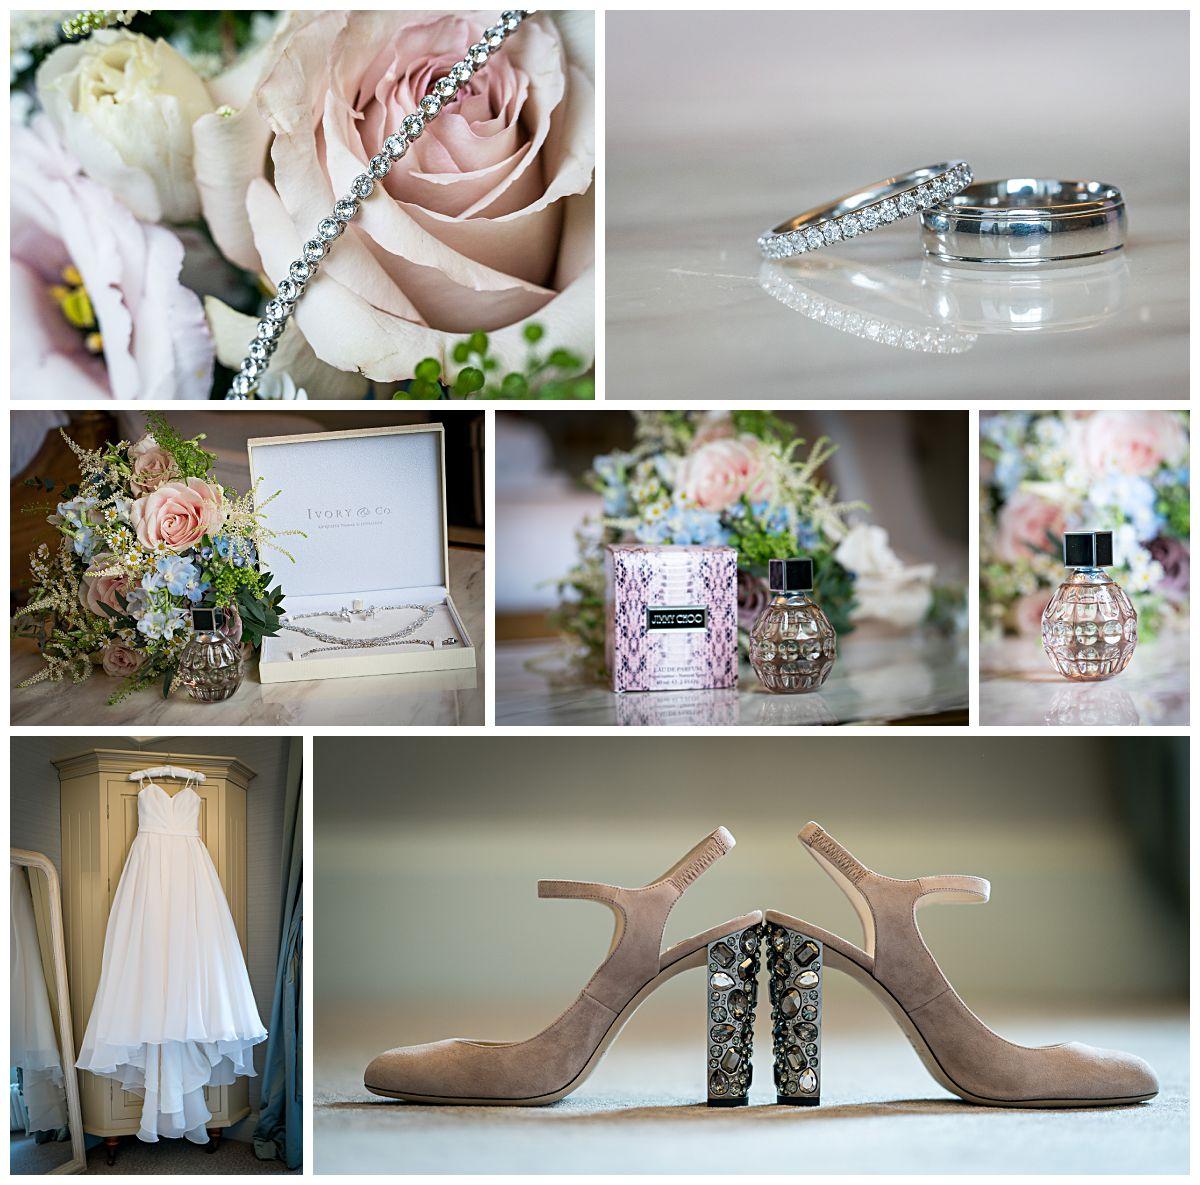 Wedding Photographer at Saltmarshe Hall near Goole and Selby